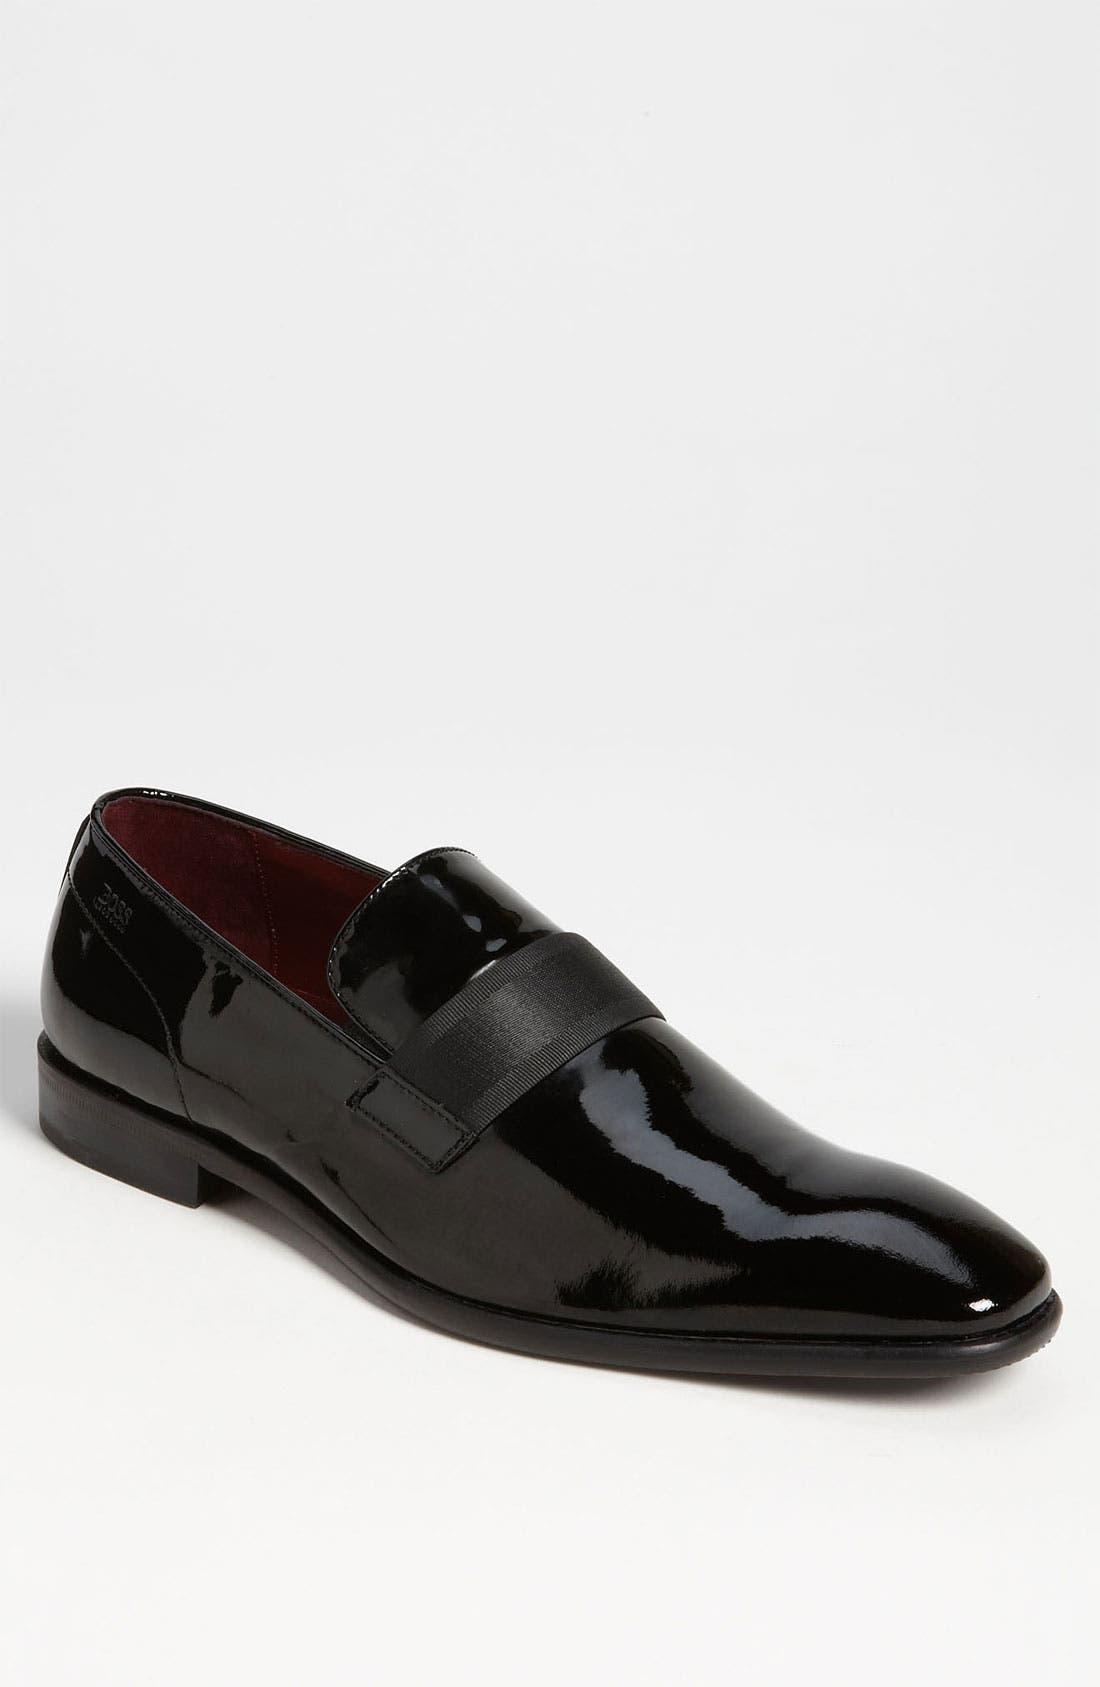 ZZDNUHUGO BOSS BOSS 'Mellion' Patent Loafer, Main, color, 001